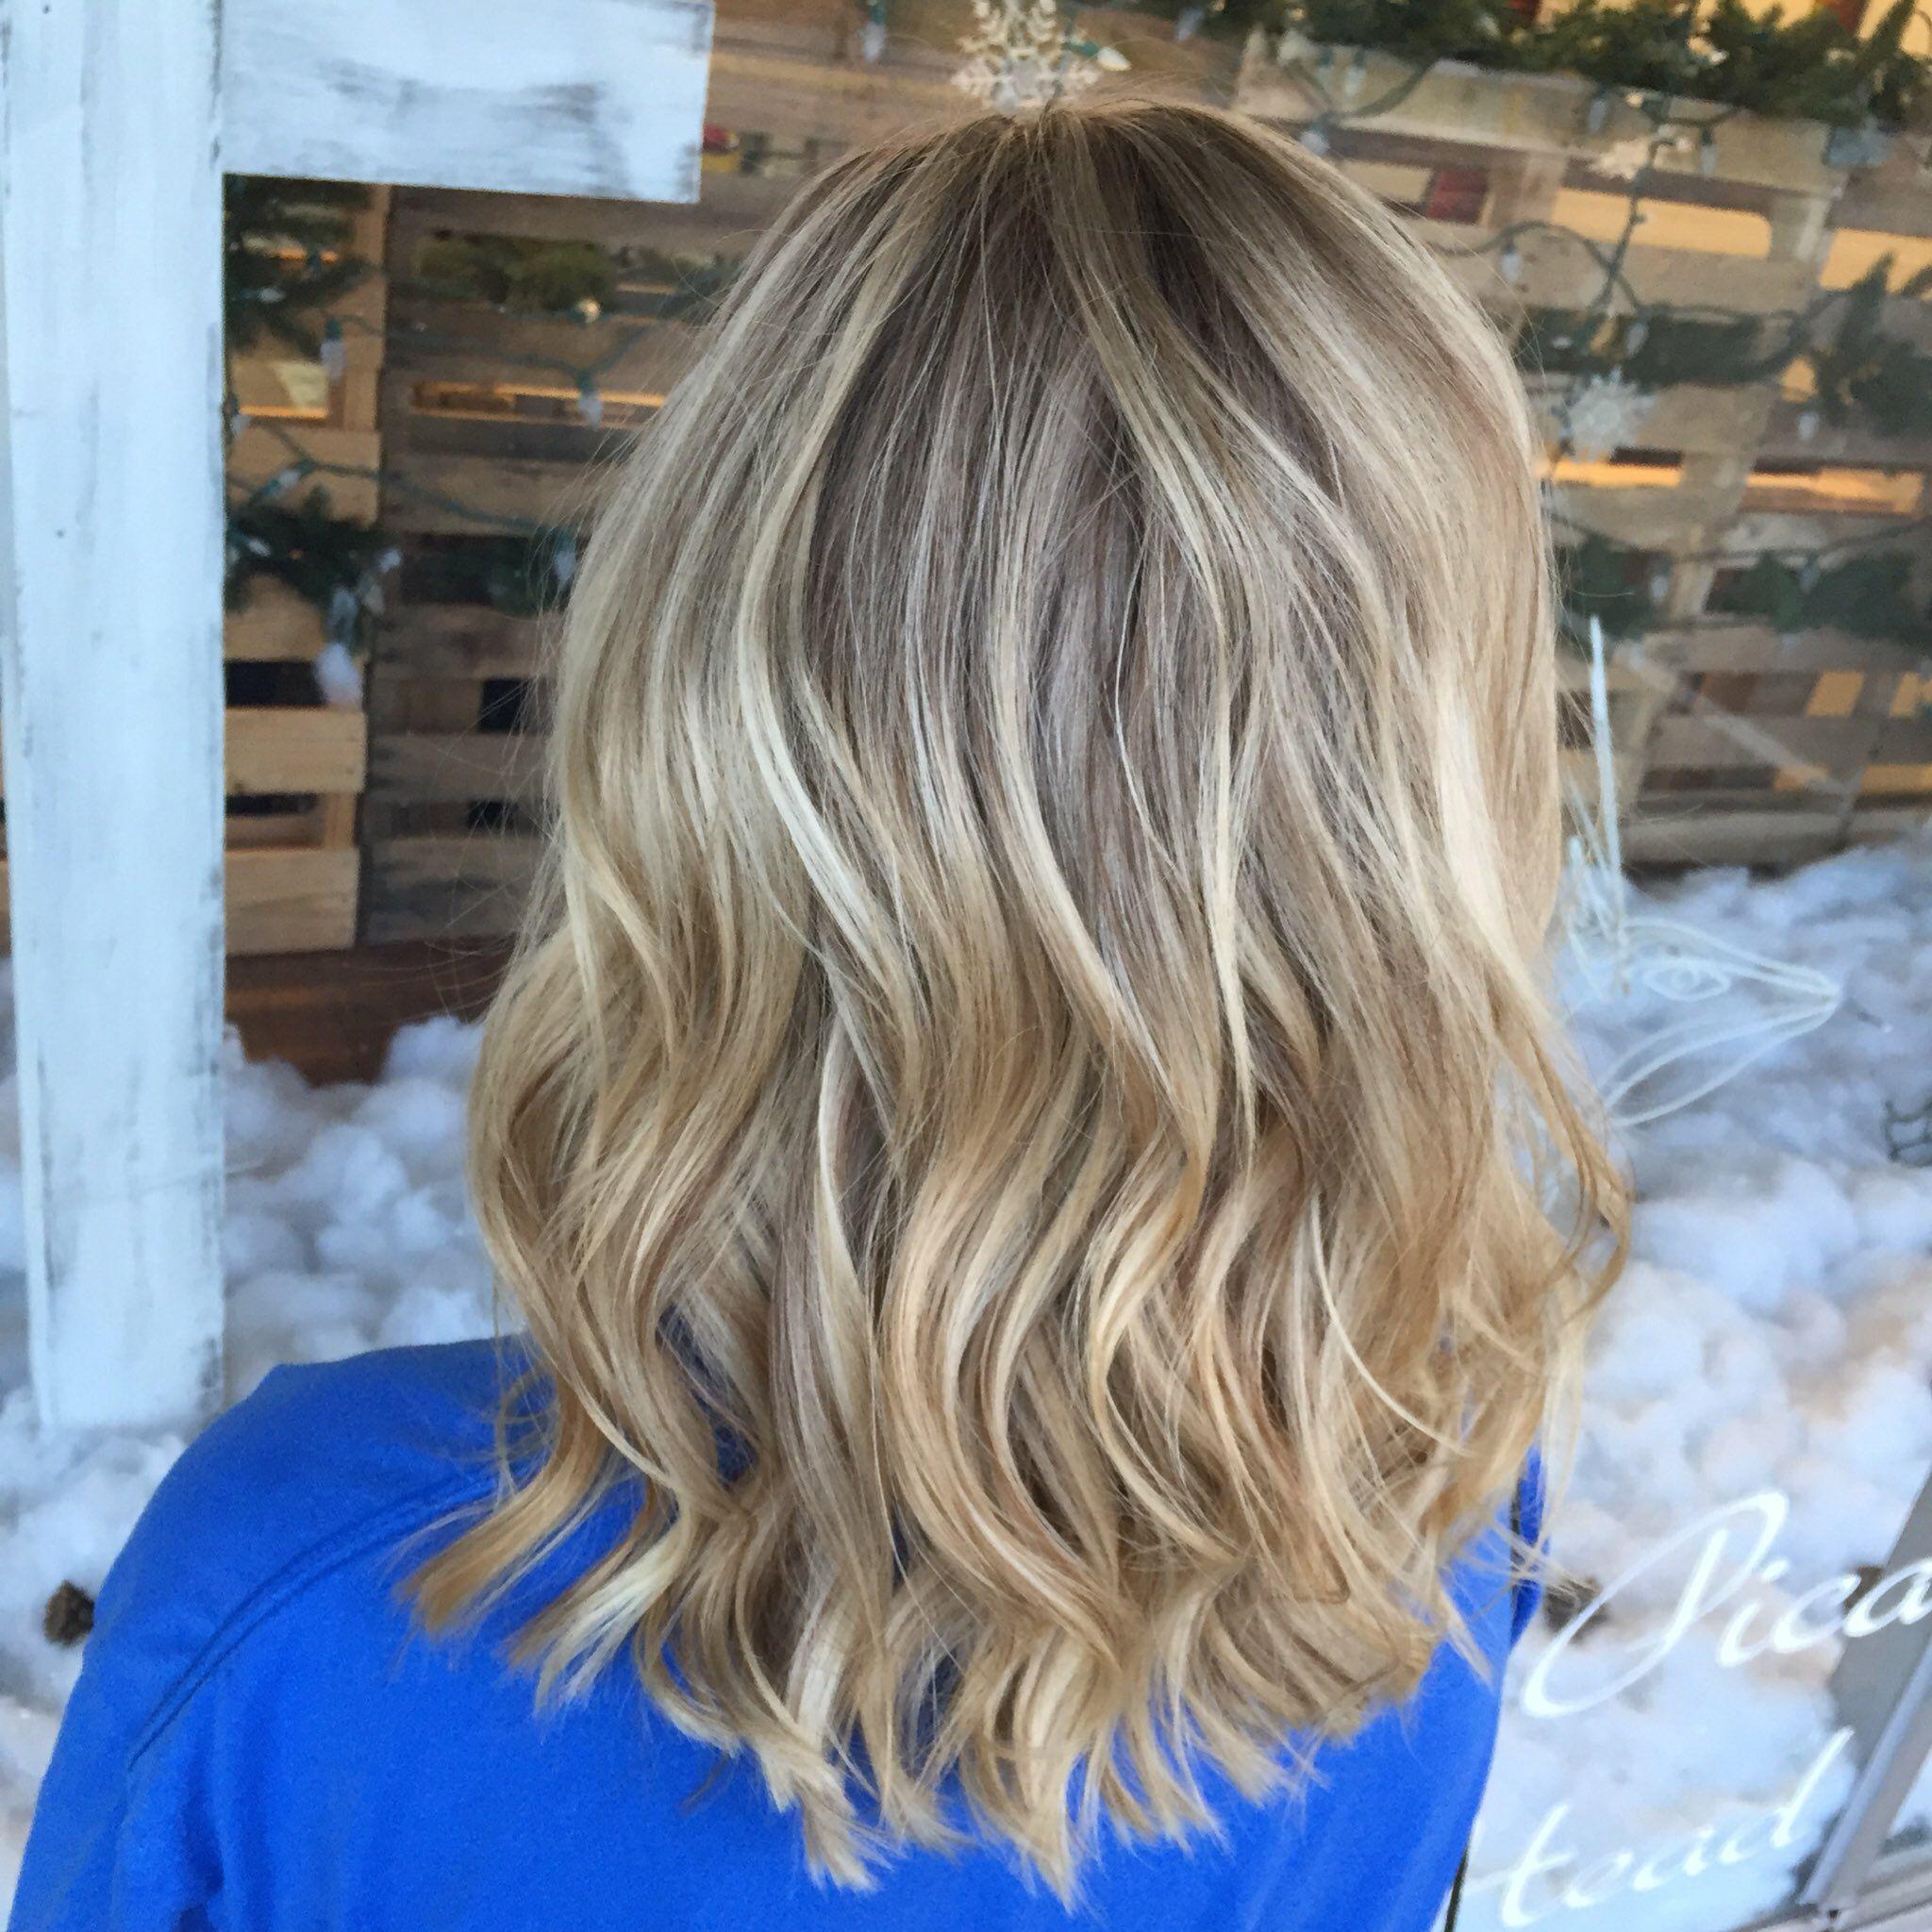 Highlights And Root Shadow Pjdoeshair Pj Does Hair Pinterest Pj